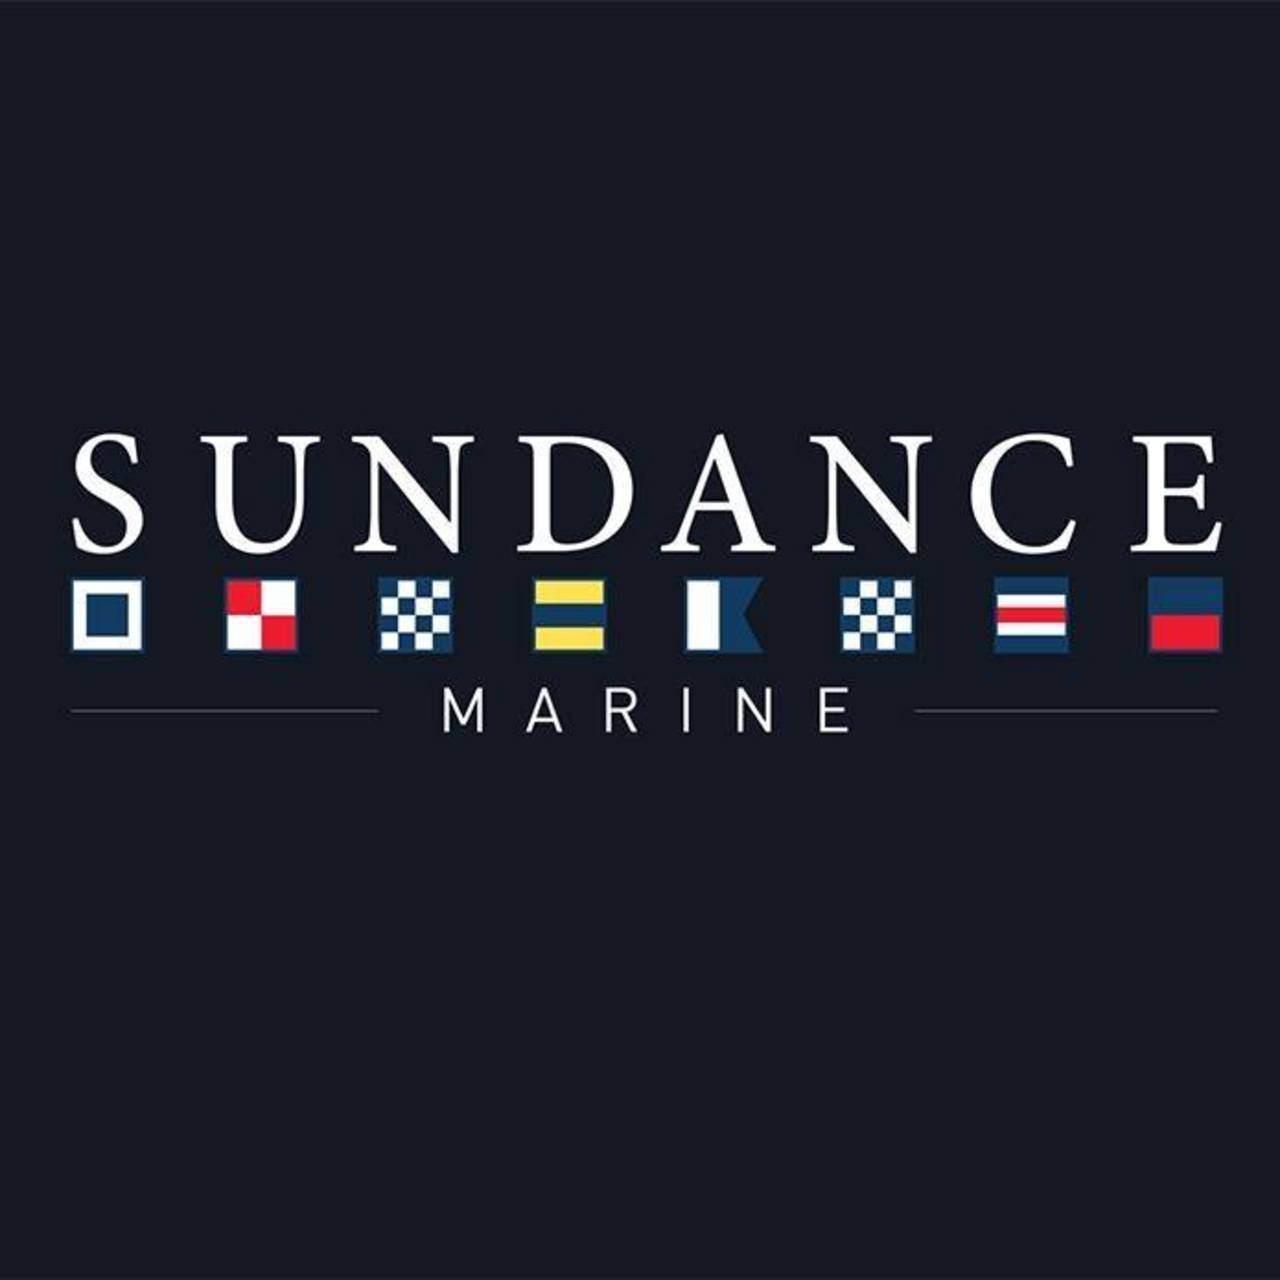 SUNDANCE MARINE SYDNEY OFFICE